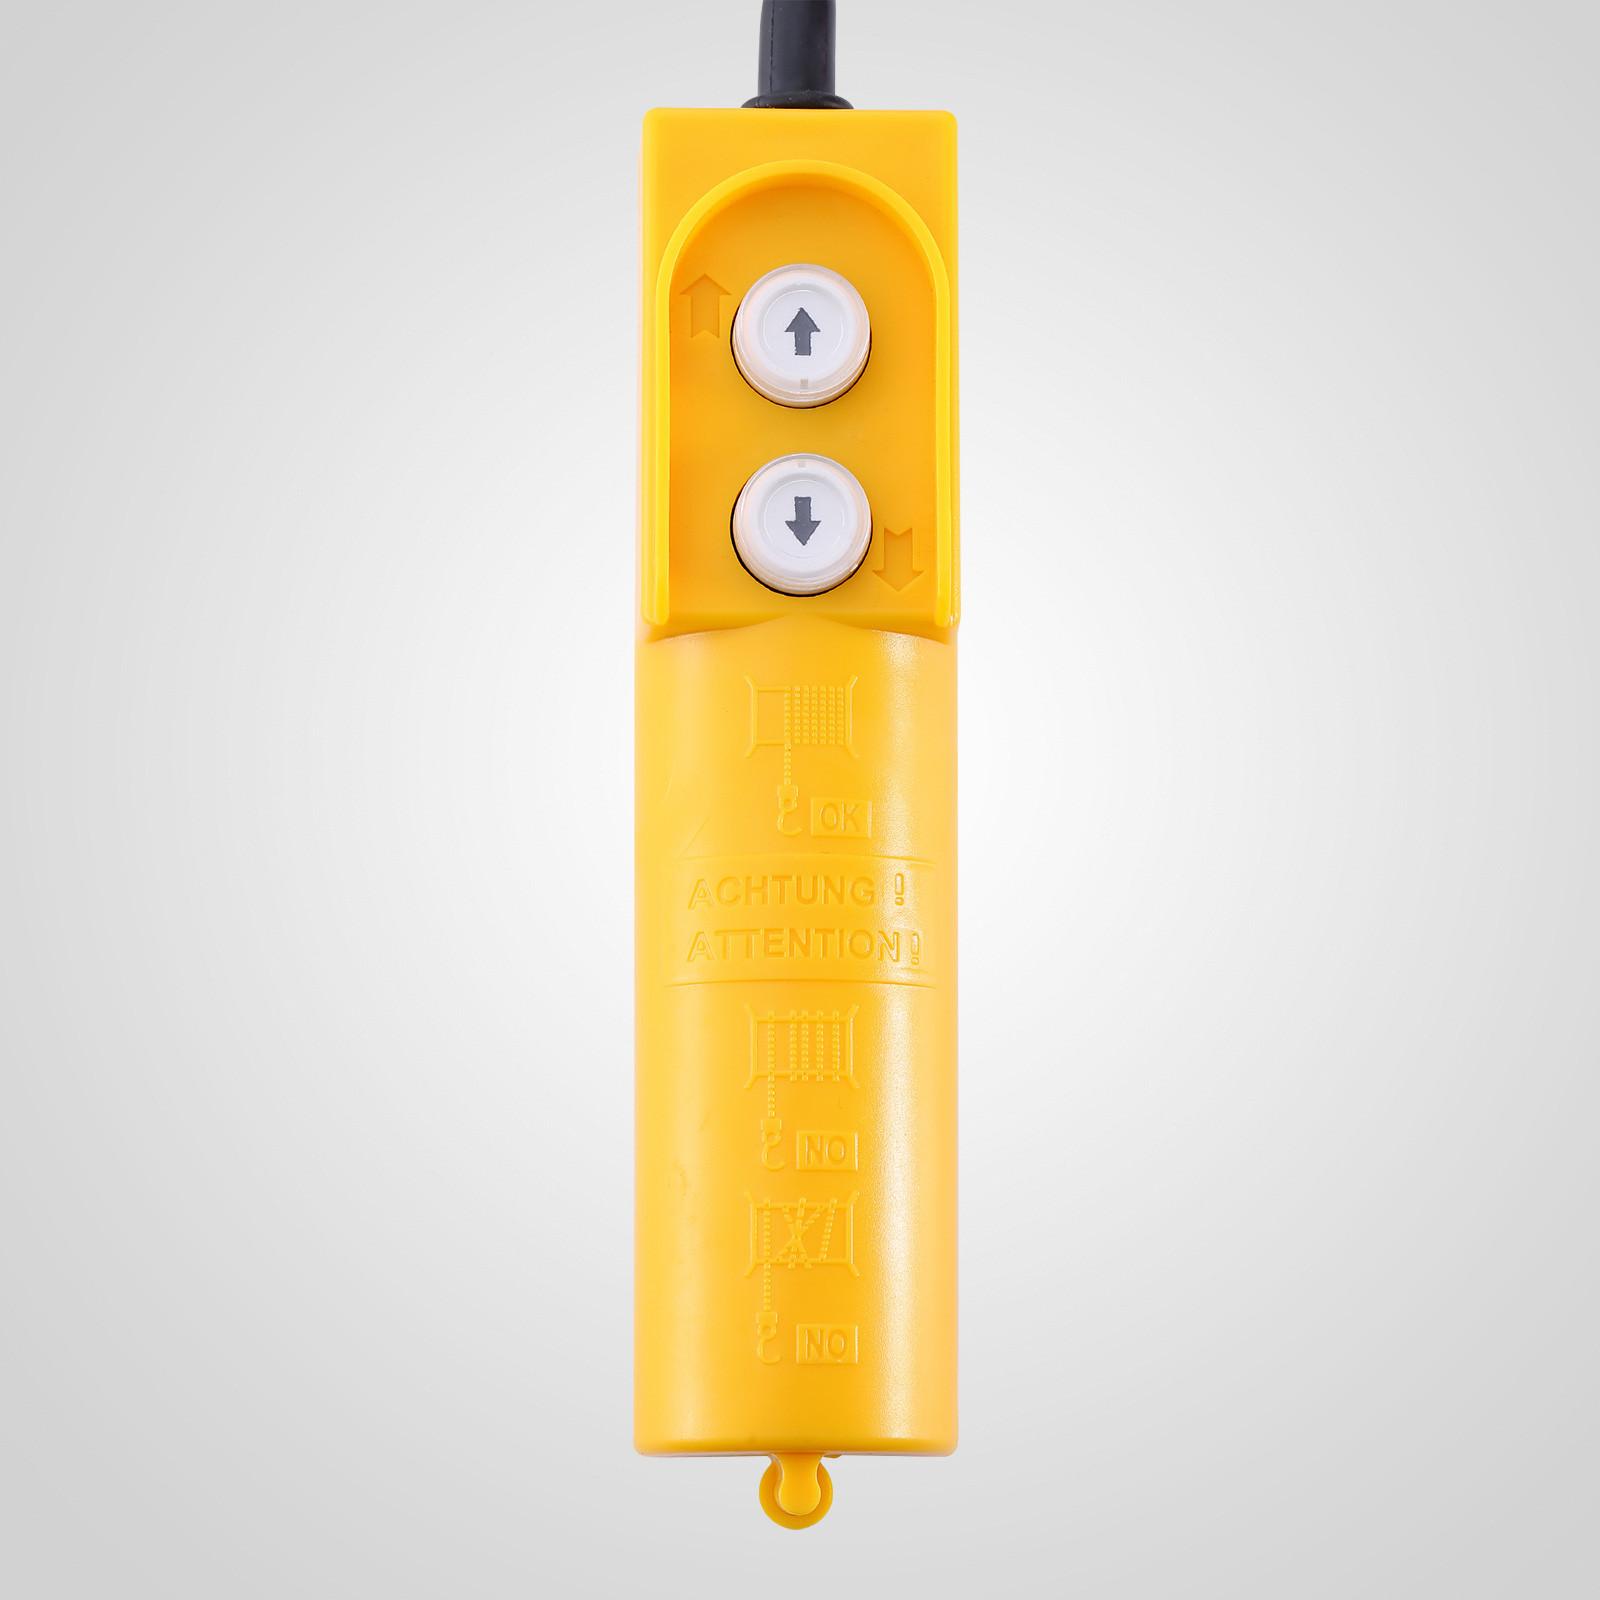 100kg-900kg-Electric-Hoist-Winch-Lifting-Engine-Crane-Cable-Lift-Hook-Garage miniature 35